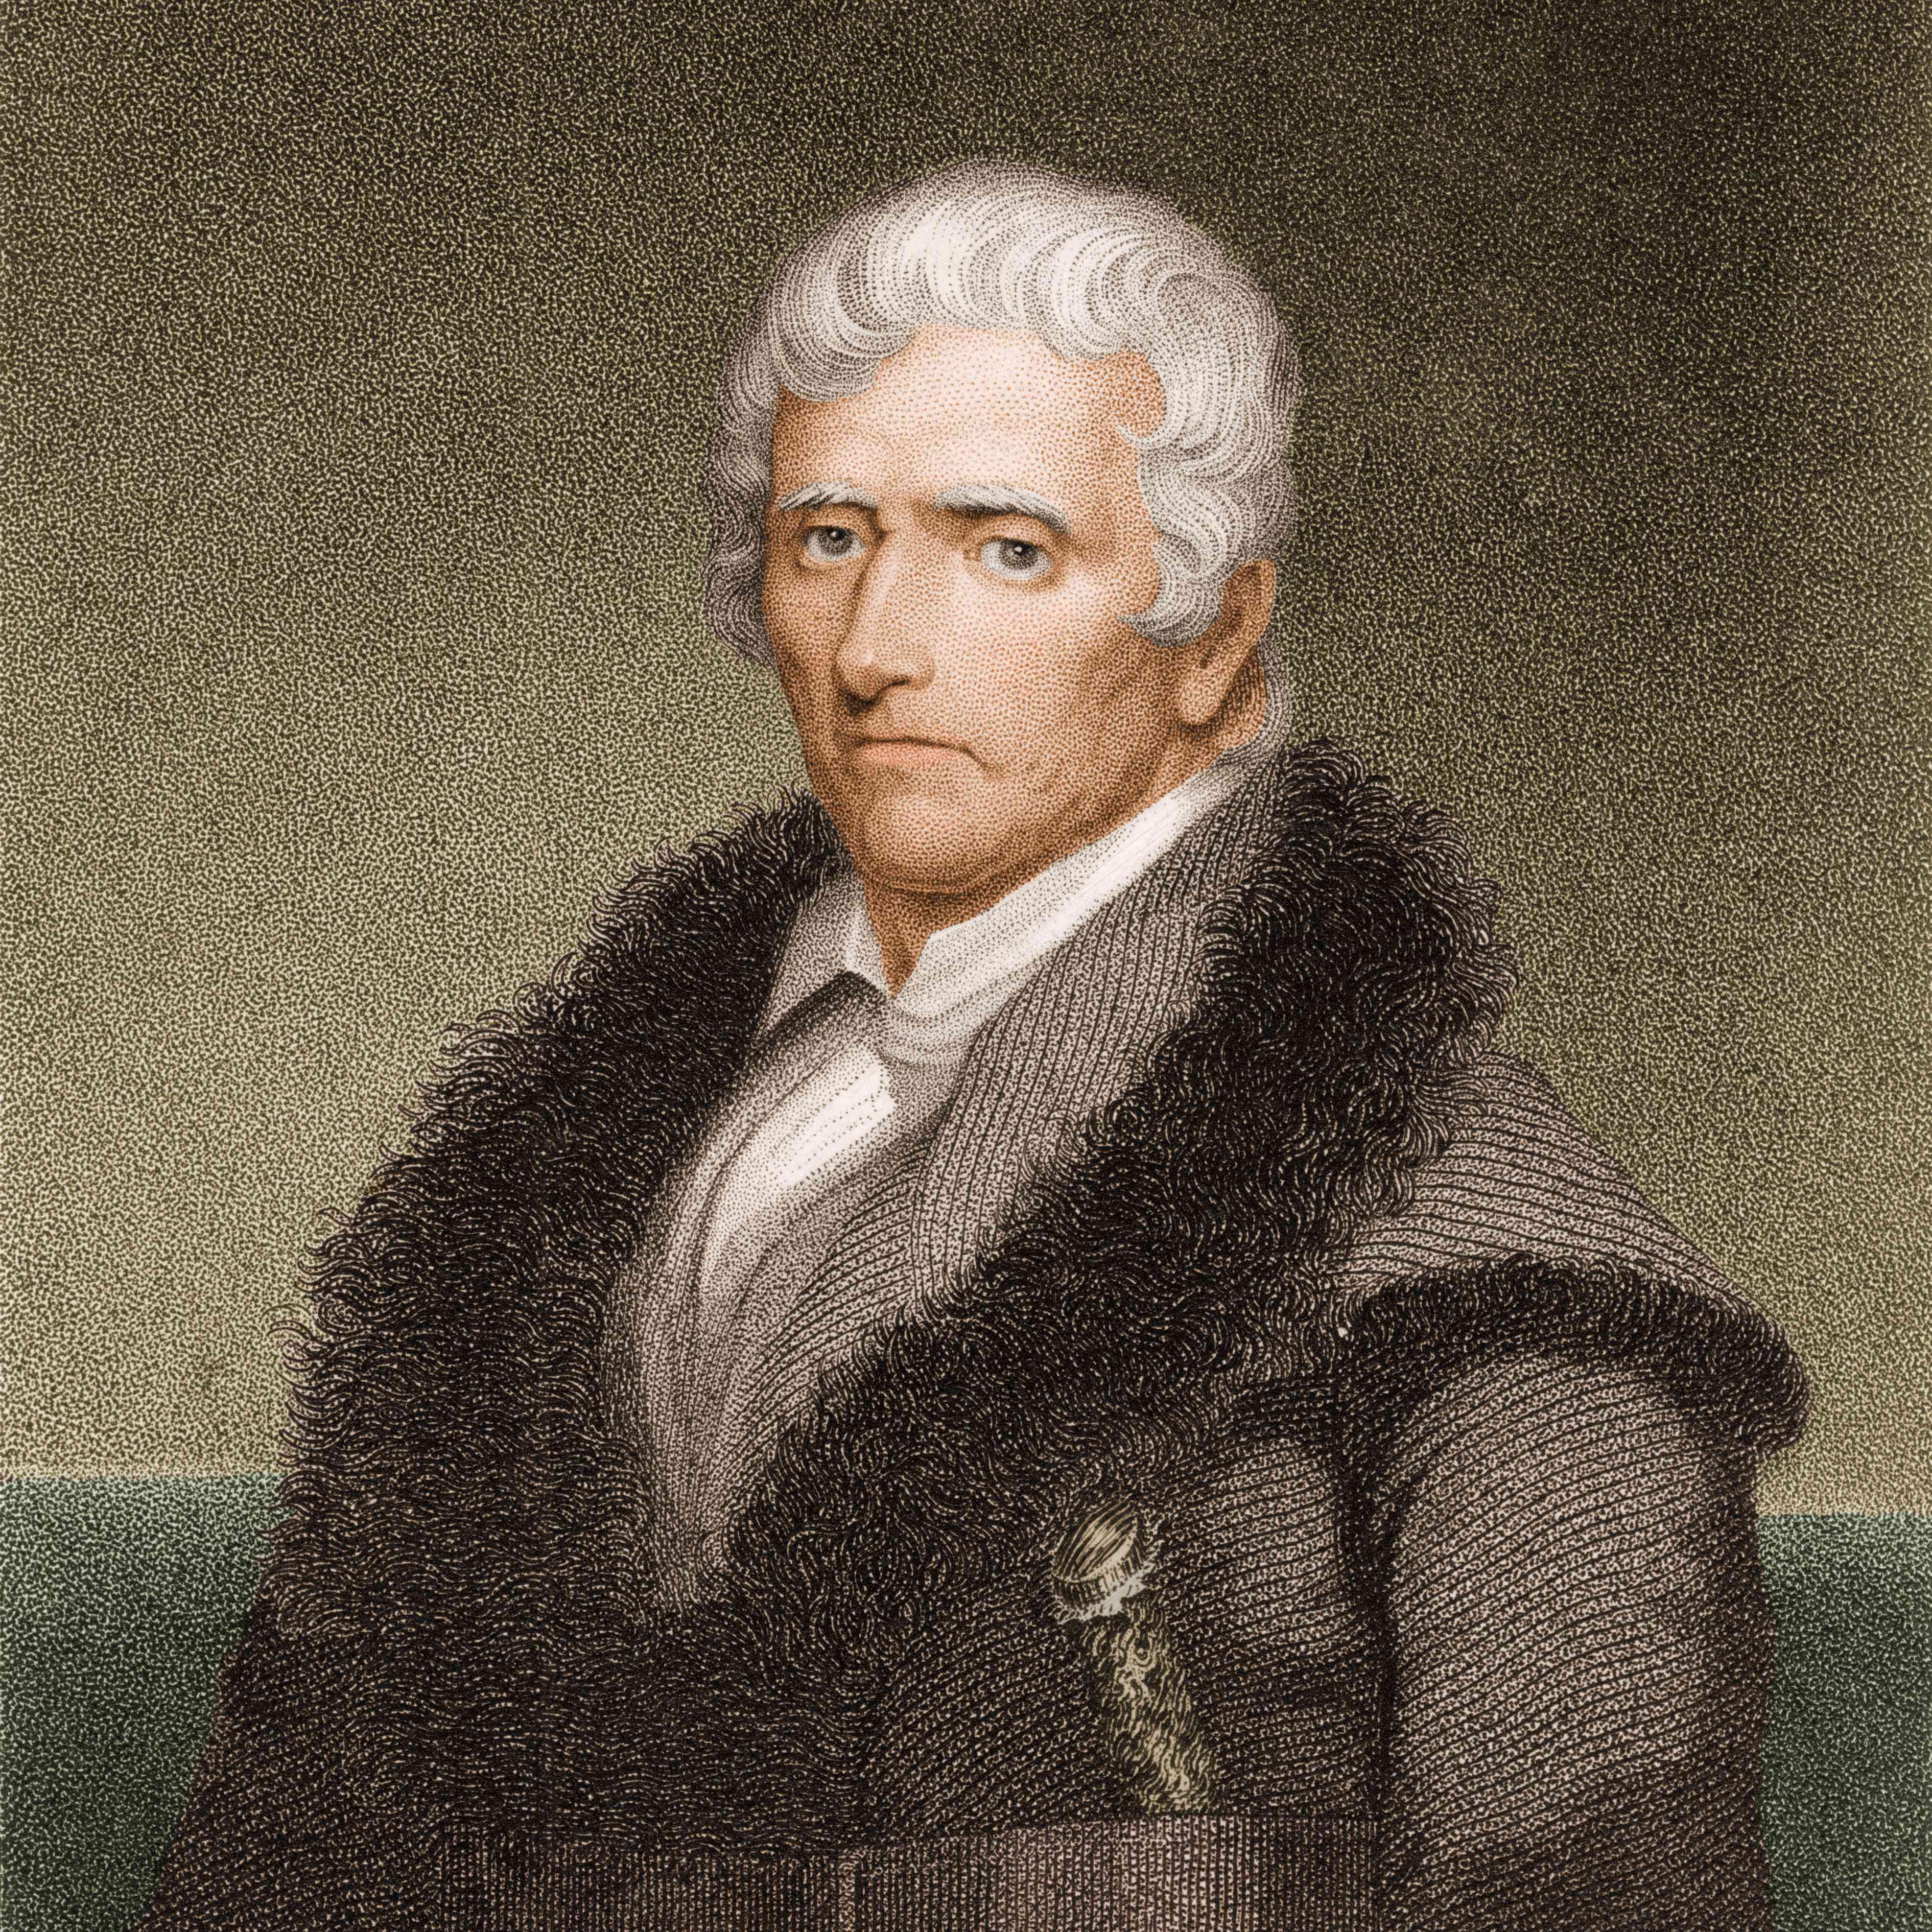 engraved portrait of Daniel Boone